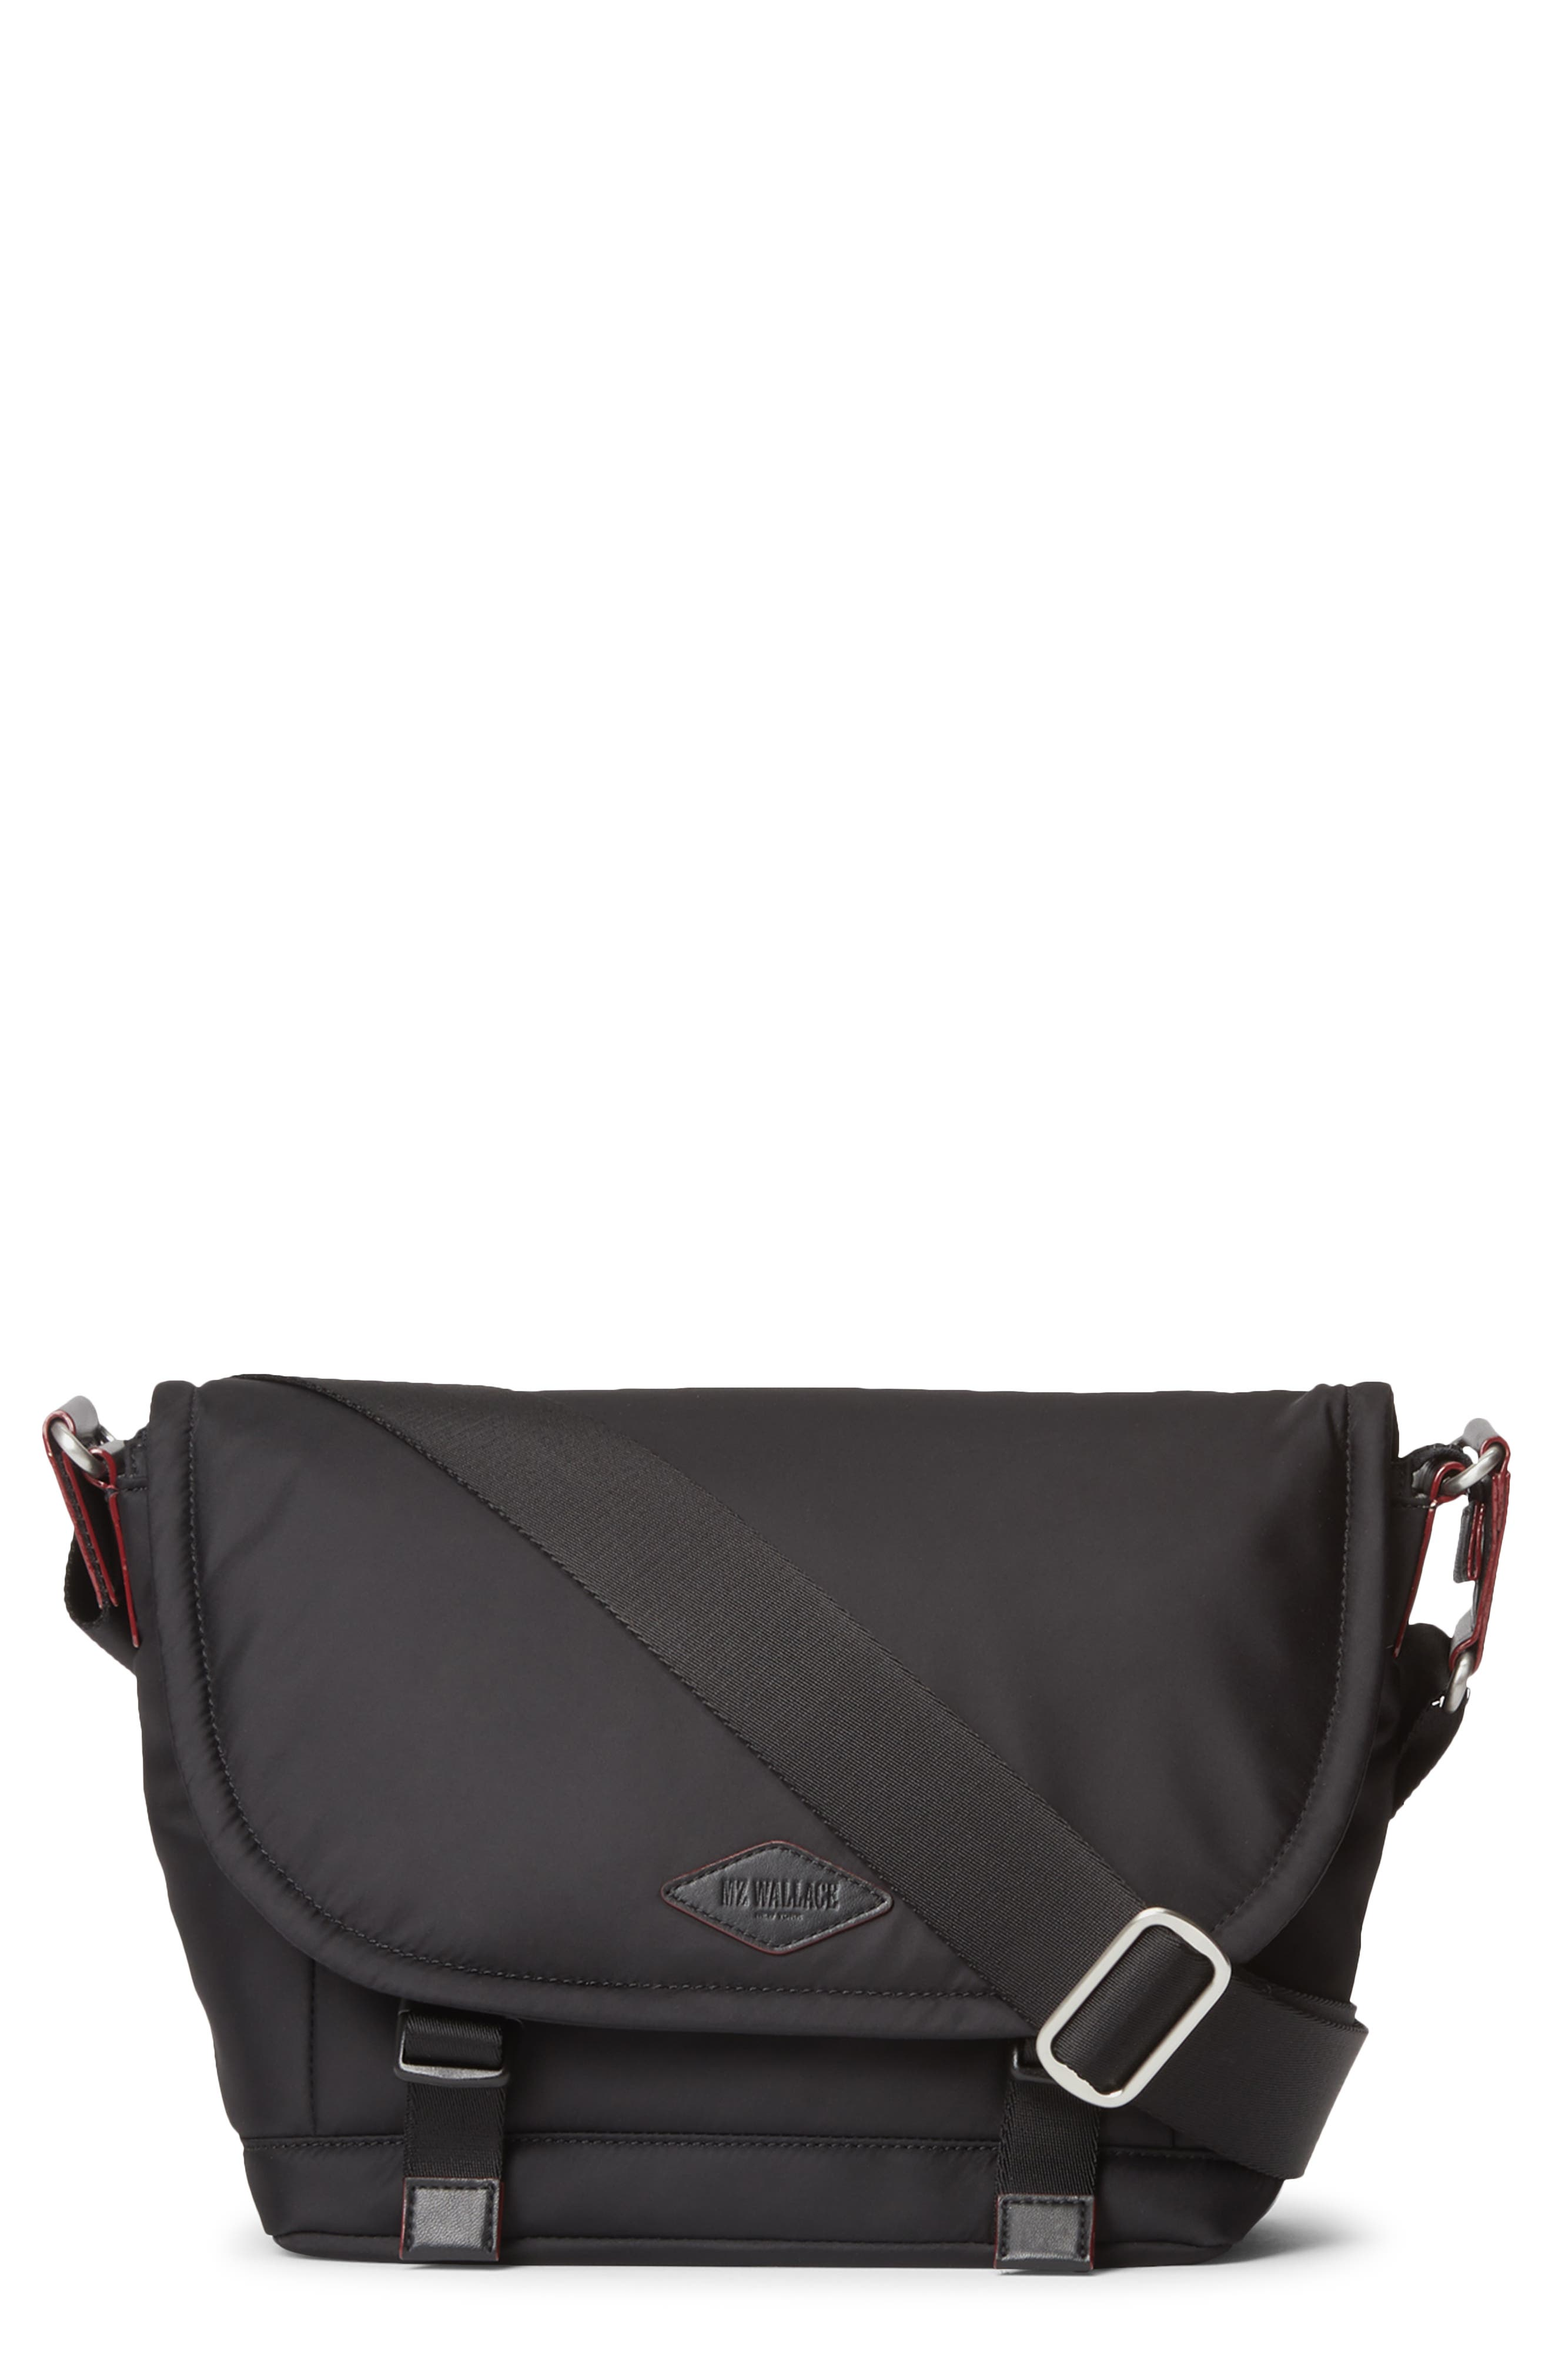 Mz Wallace Small Bleecker Nylon Messenger Bag - Black